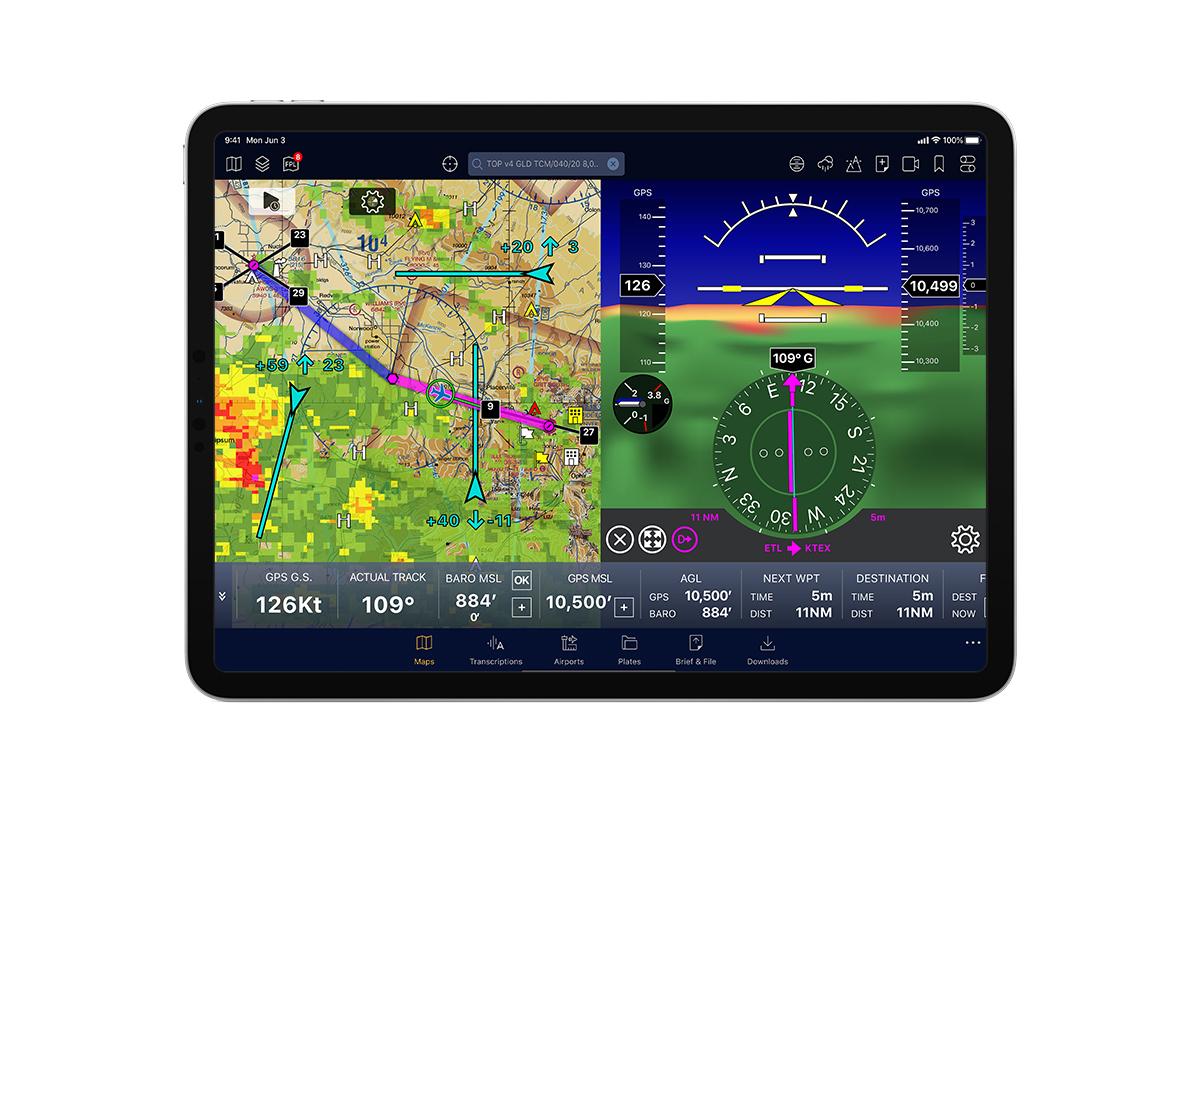 Appareo Introduces Electronic Flight Bag App